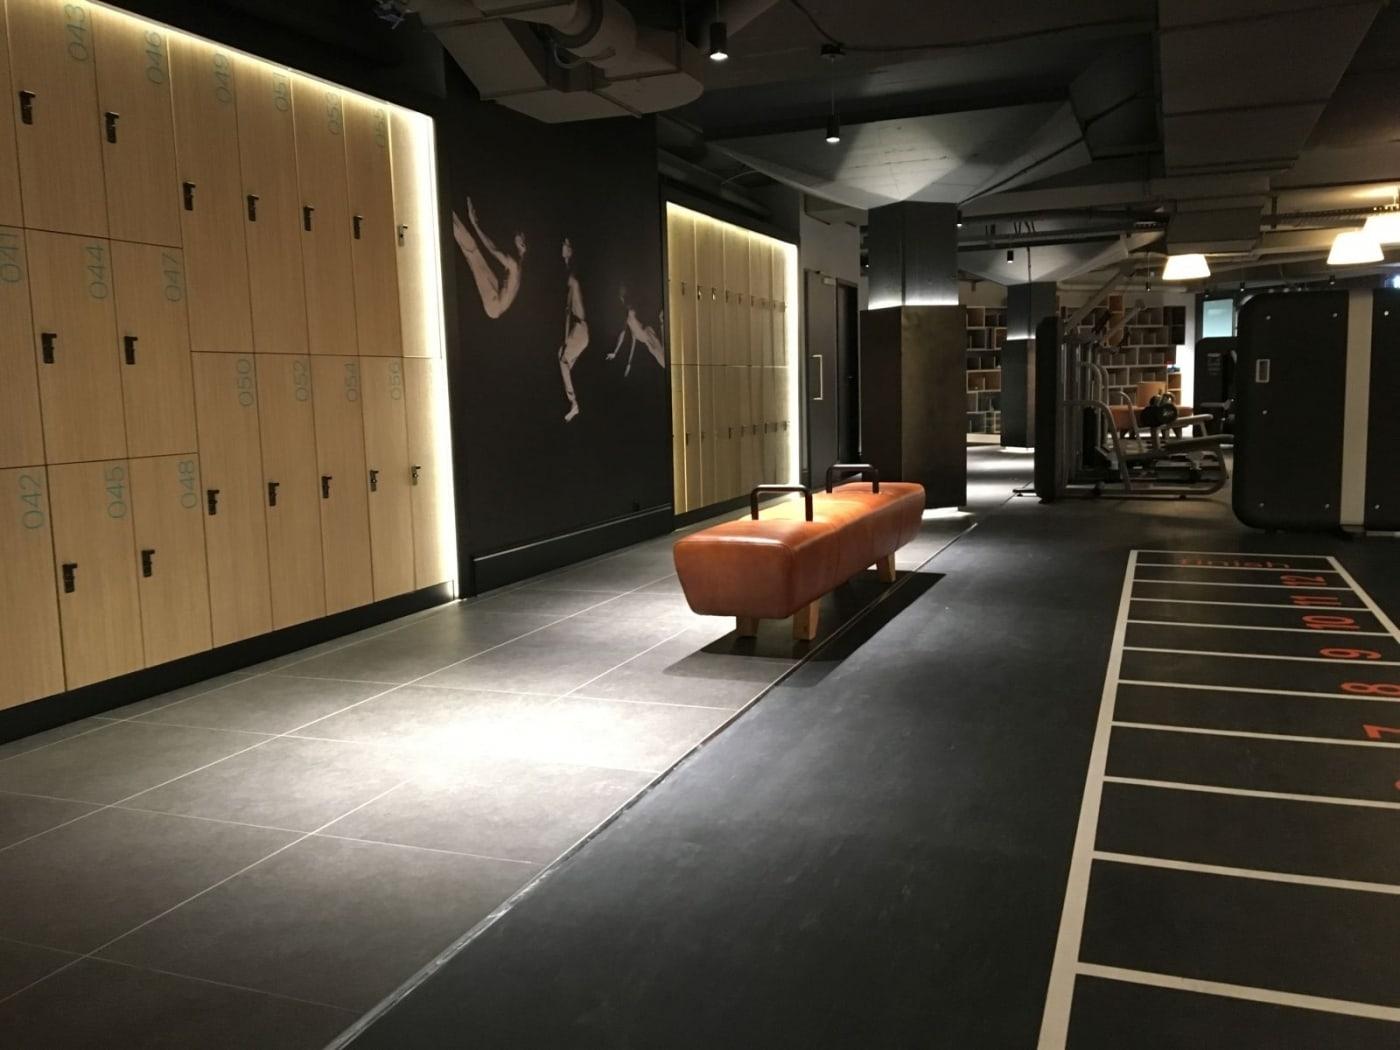 szafki ubraniowe szafki fitness awki do szatni meble fitness retro sofa i awka atepaa. Black Bedroom Furniture Sets. Home Design Ideas